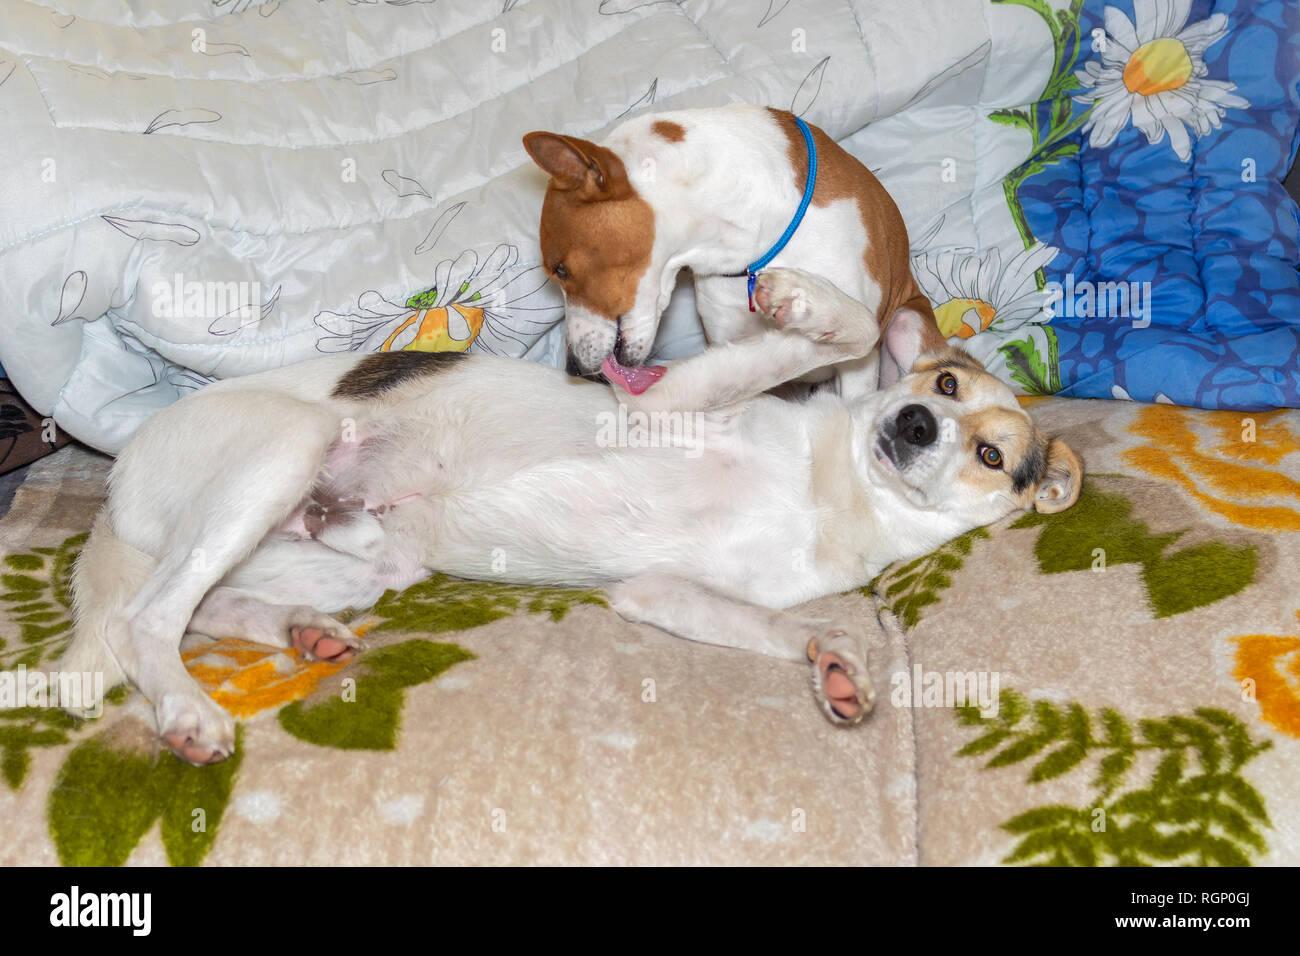 Mature Basenji dog lick clean mixed breed dog lying on a sofa - Stock Image